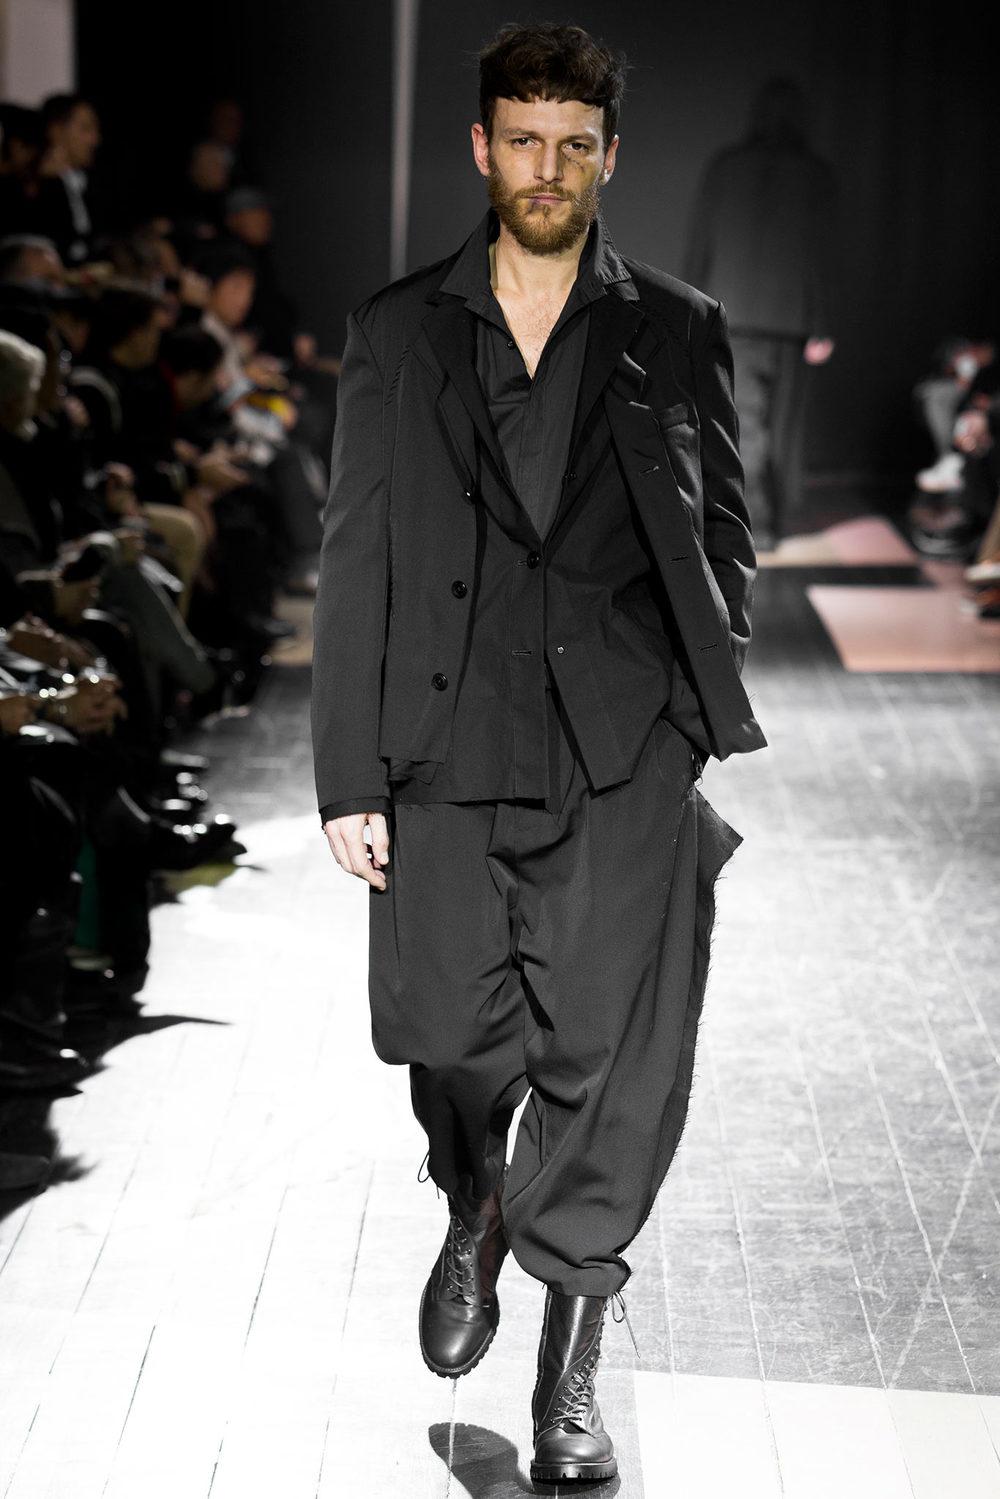 This suit fits (Yohji Yamamoto FW14)